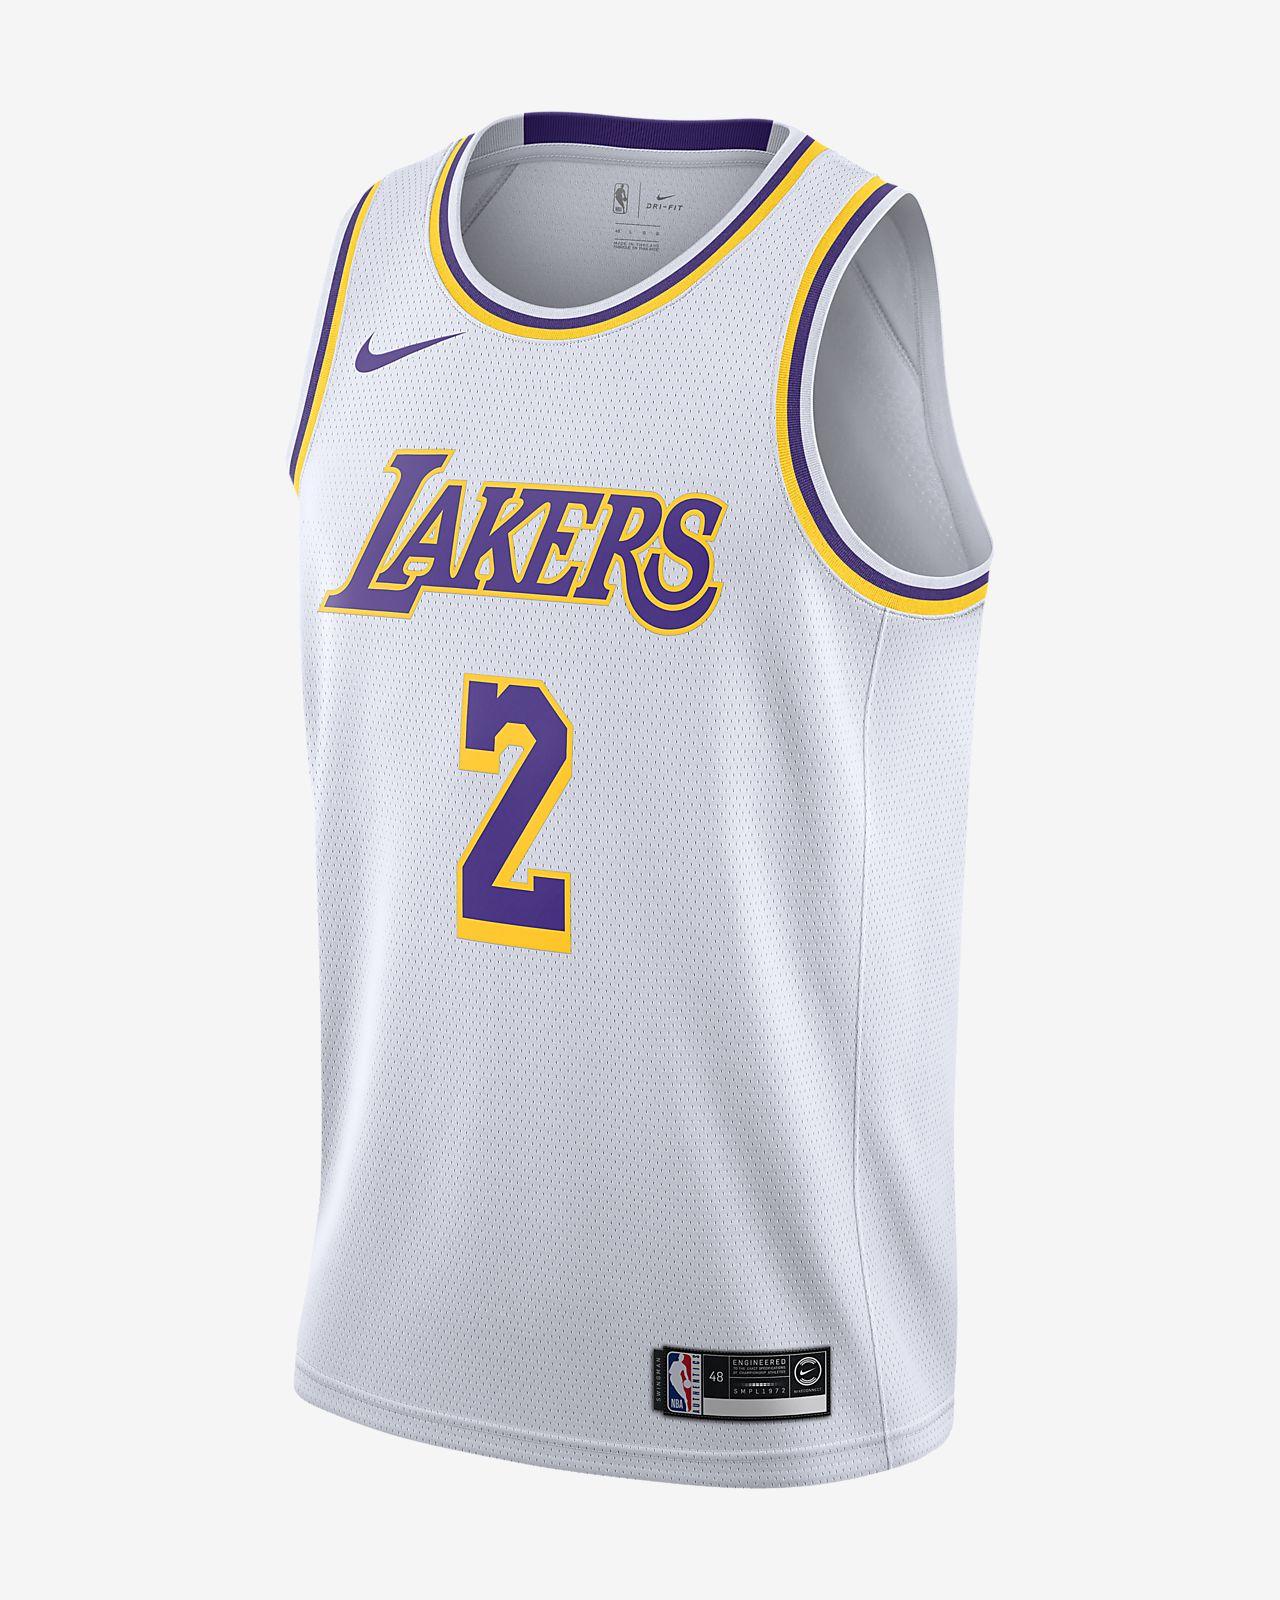 3fe83c8d5c1e Men s Nike NBA Connected Jersey. Lonzo Ball Association Edition Swingman  (Los Angeles Lakers)